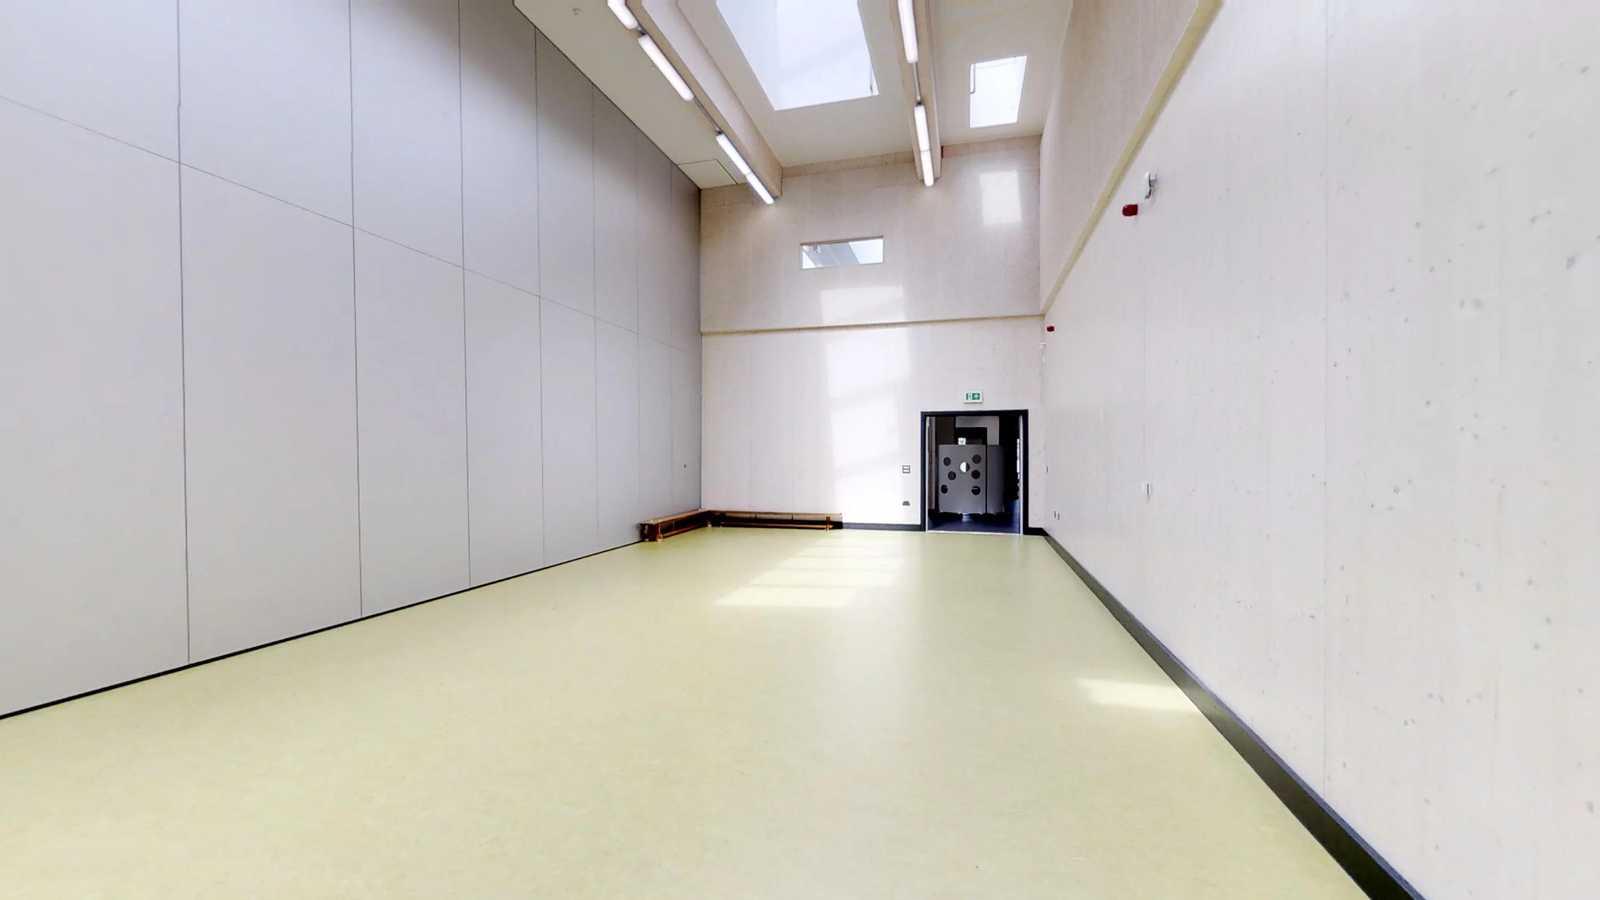 Smaller hall